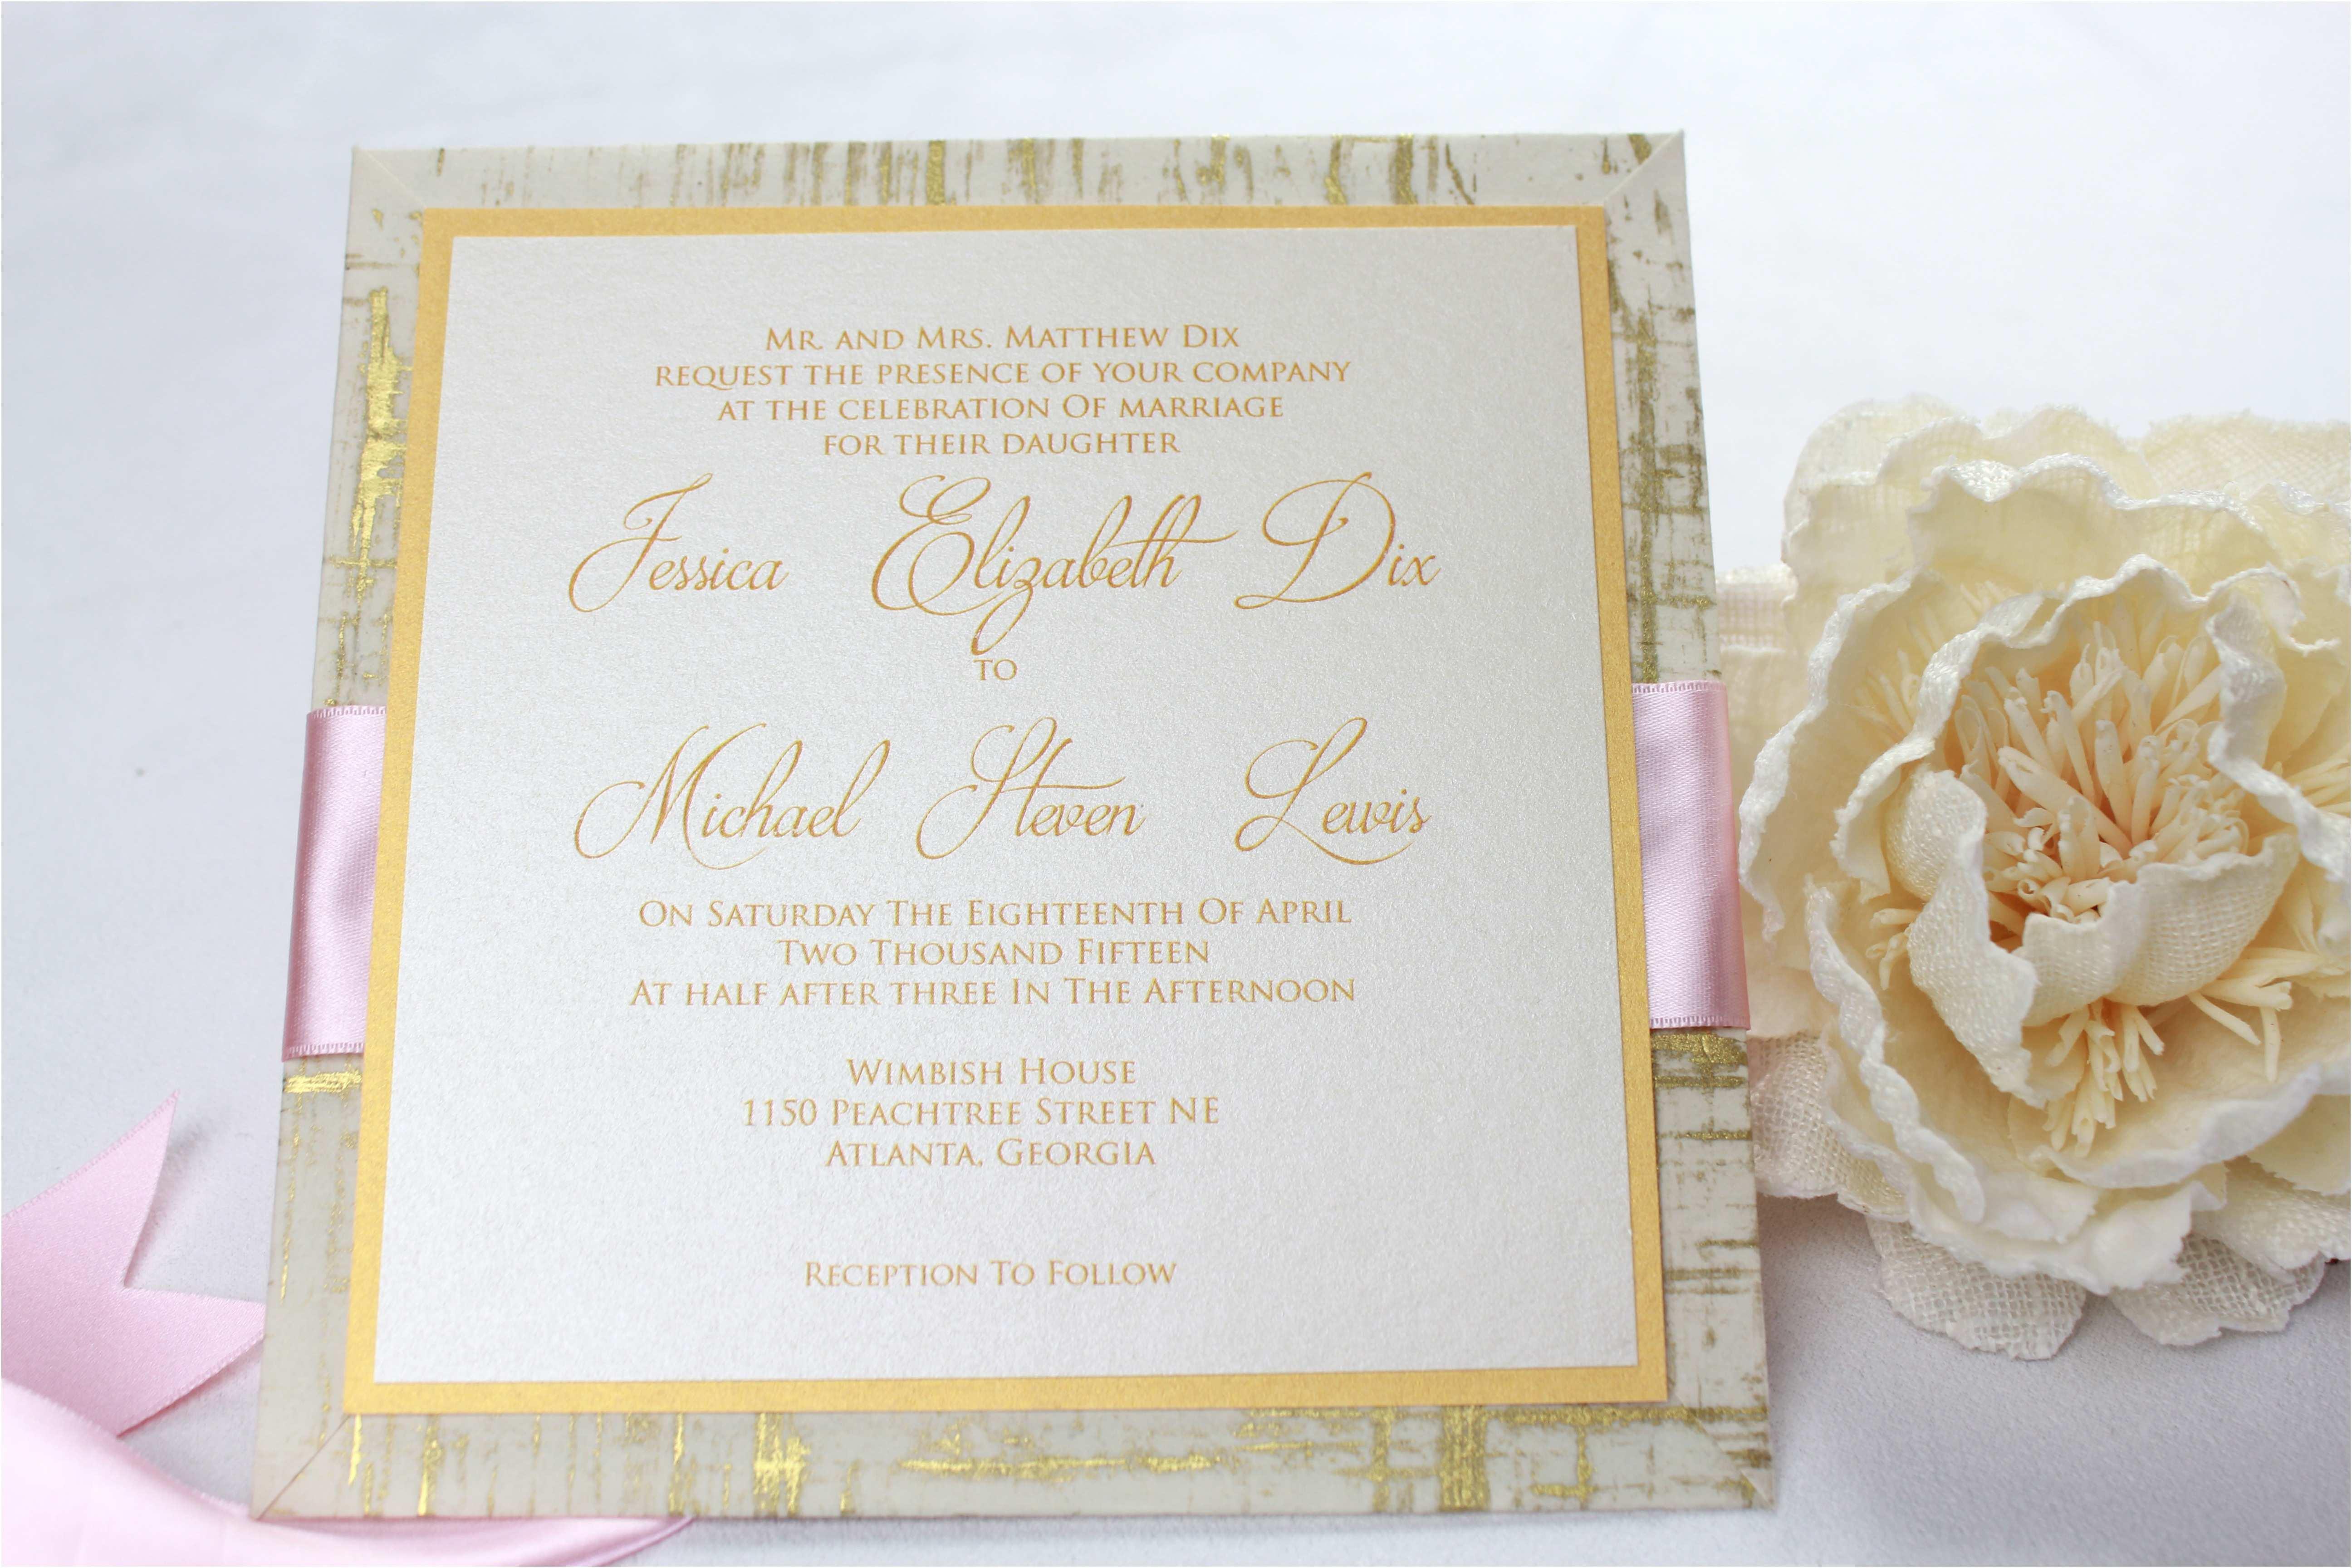 Couture Wedding Invitations Wedding Invitation Templates Couture Wedding Invitations